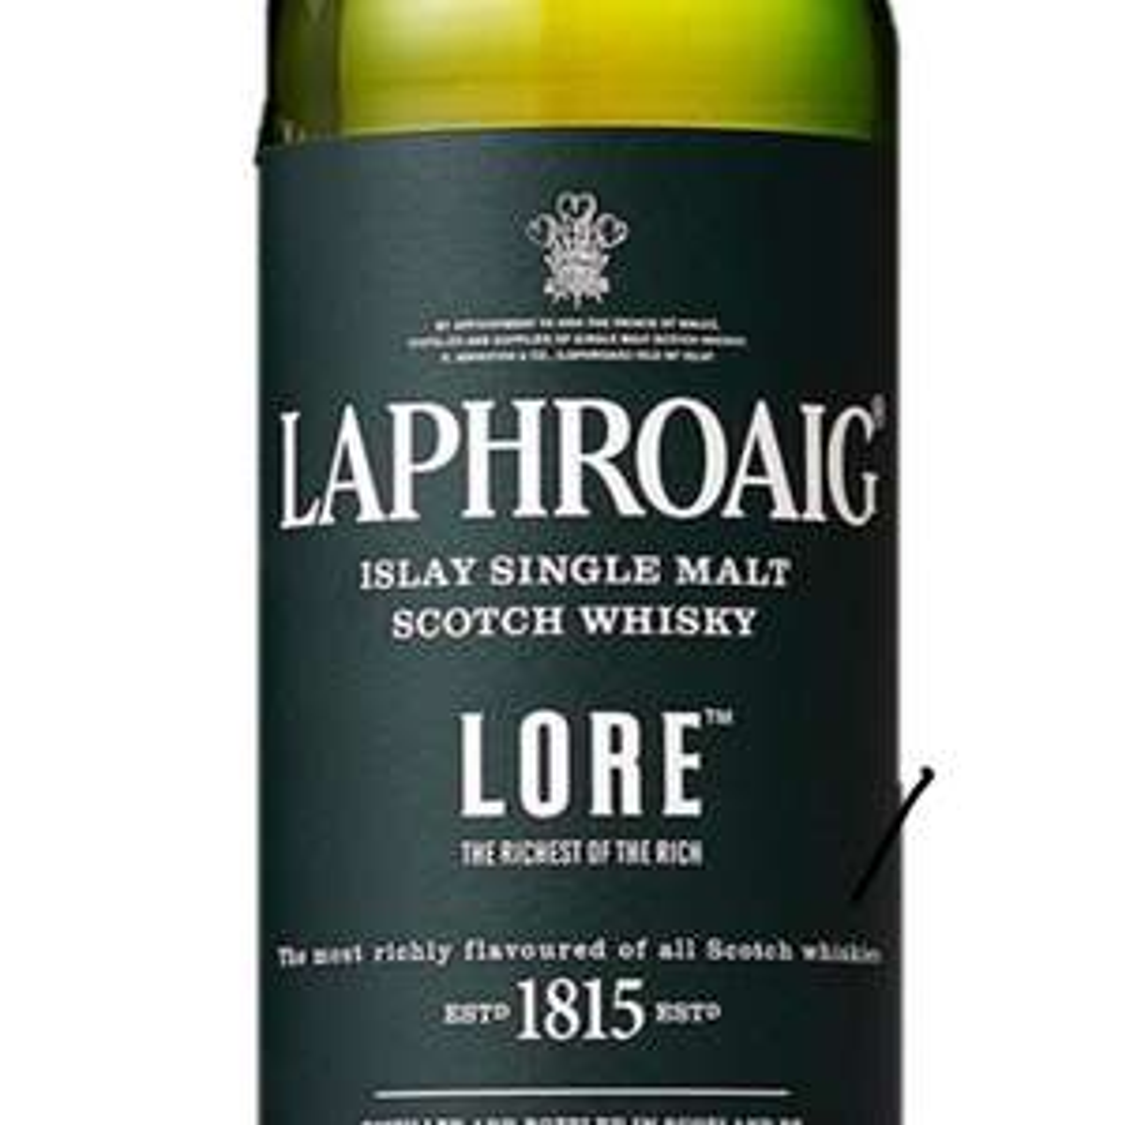 Laphroaig Lore 70cl - £55 Amazon Lightning Deal